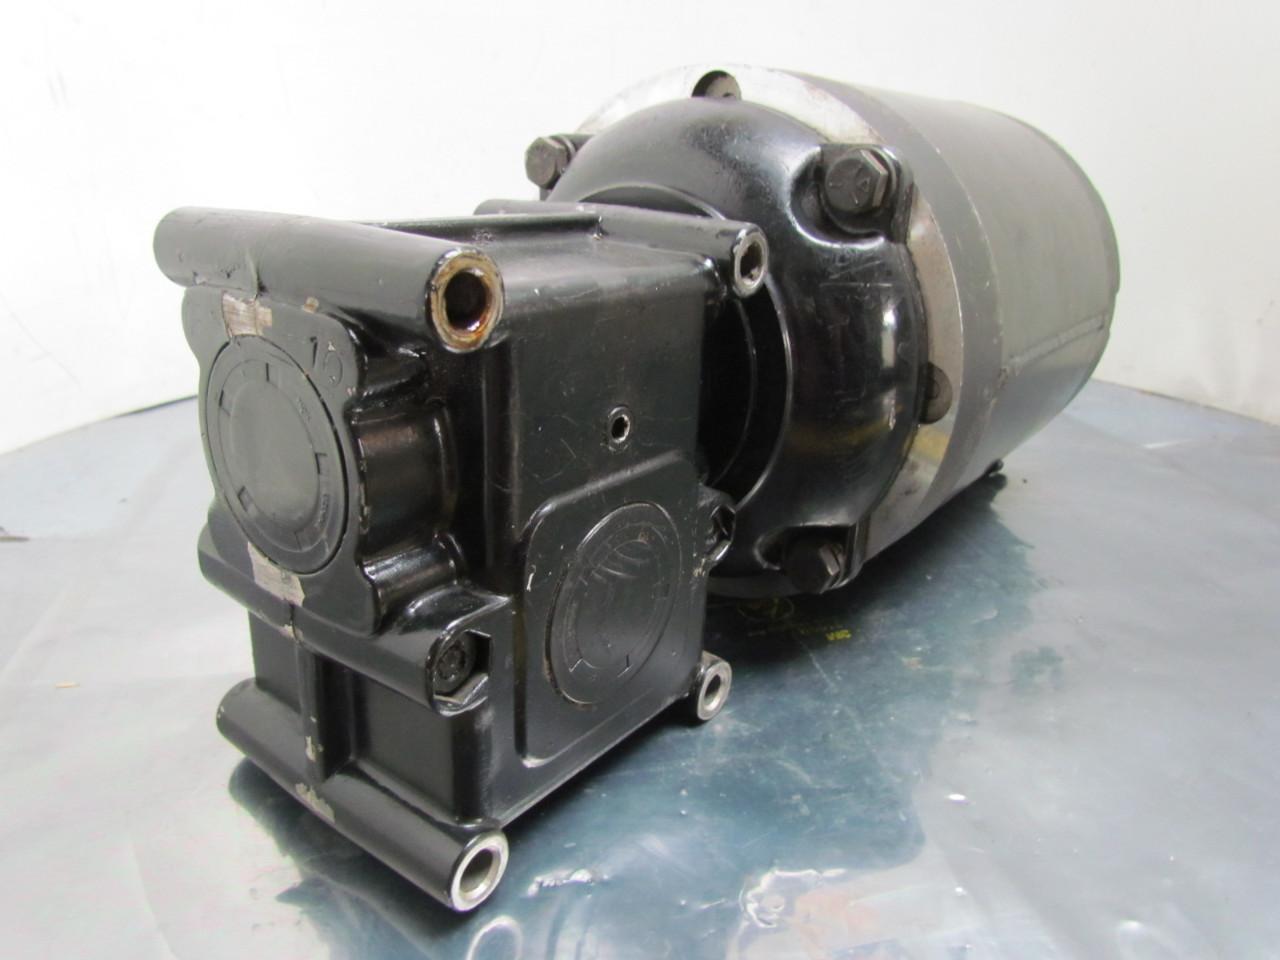 Quipp 1 2 Hp 3ph 56c Gear Motor W Morse 15gedc Speed